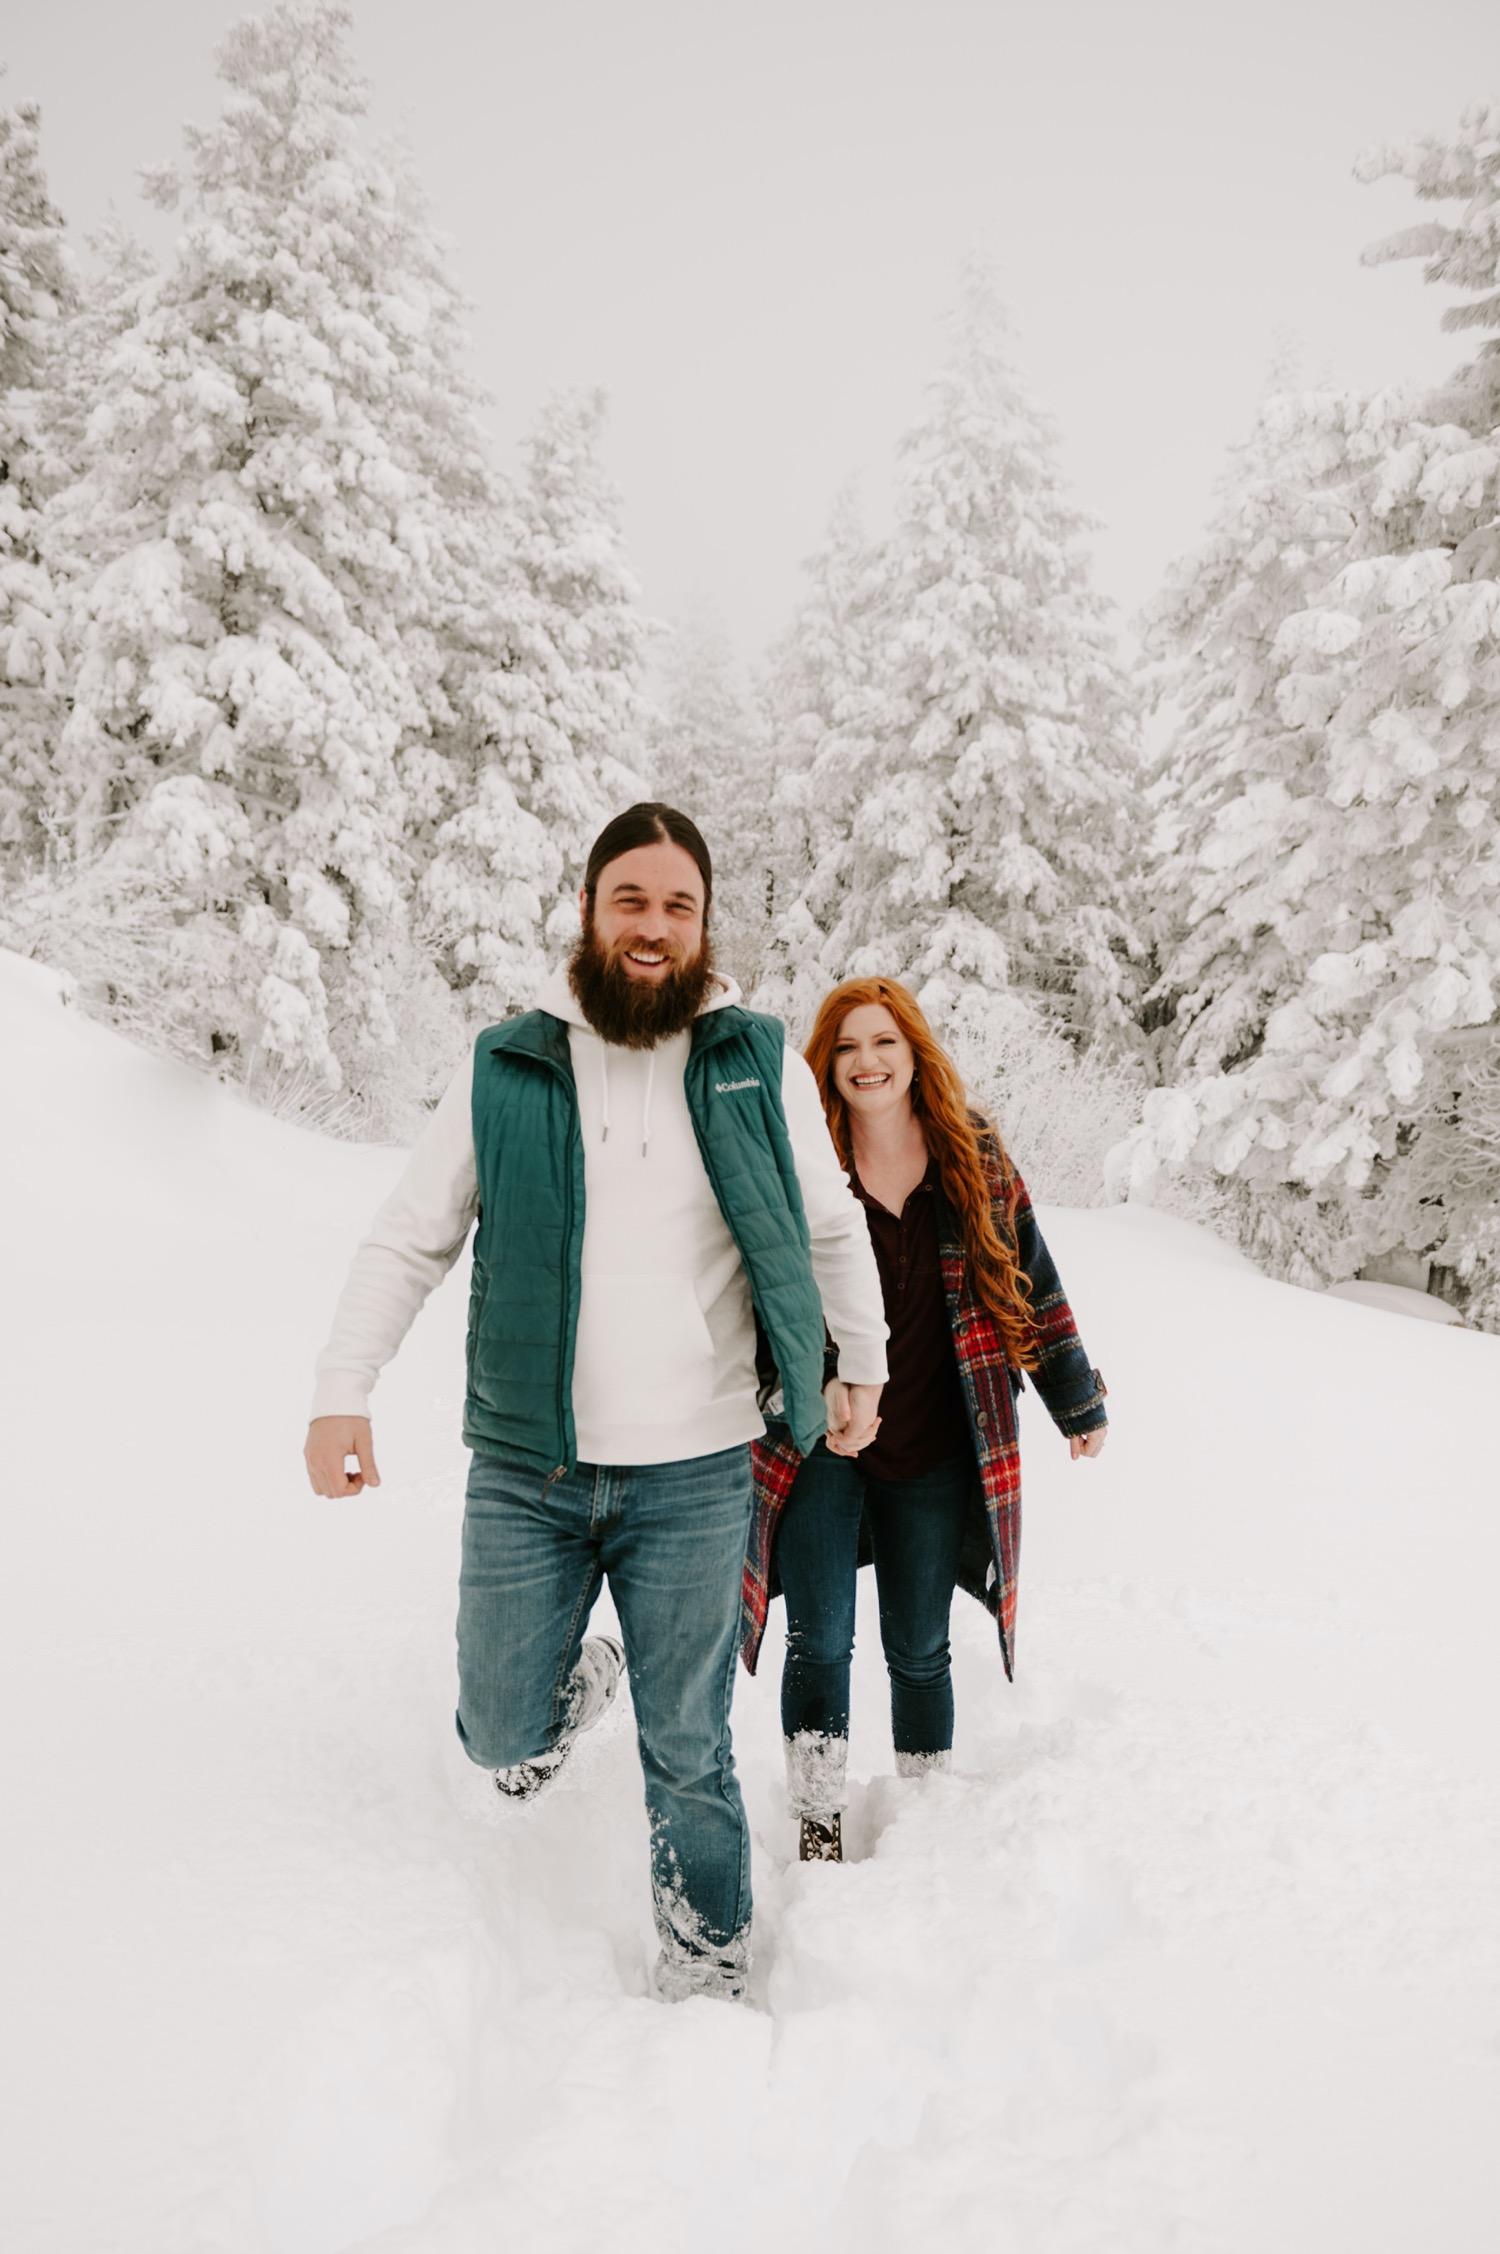 Snowy Mountain Engagements at Bogus Basin in Idaho.